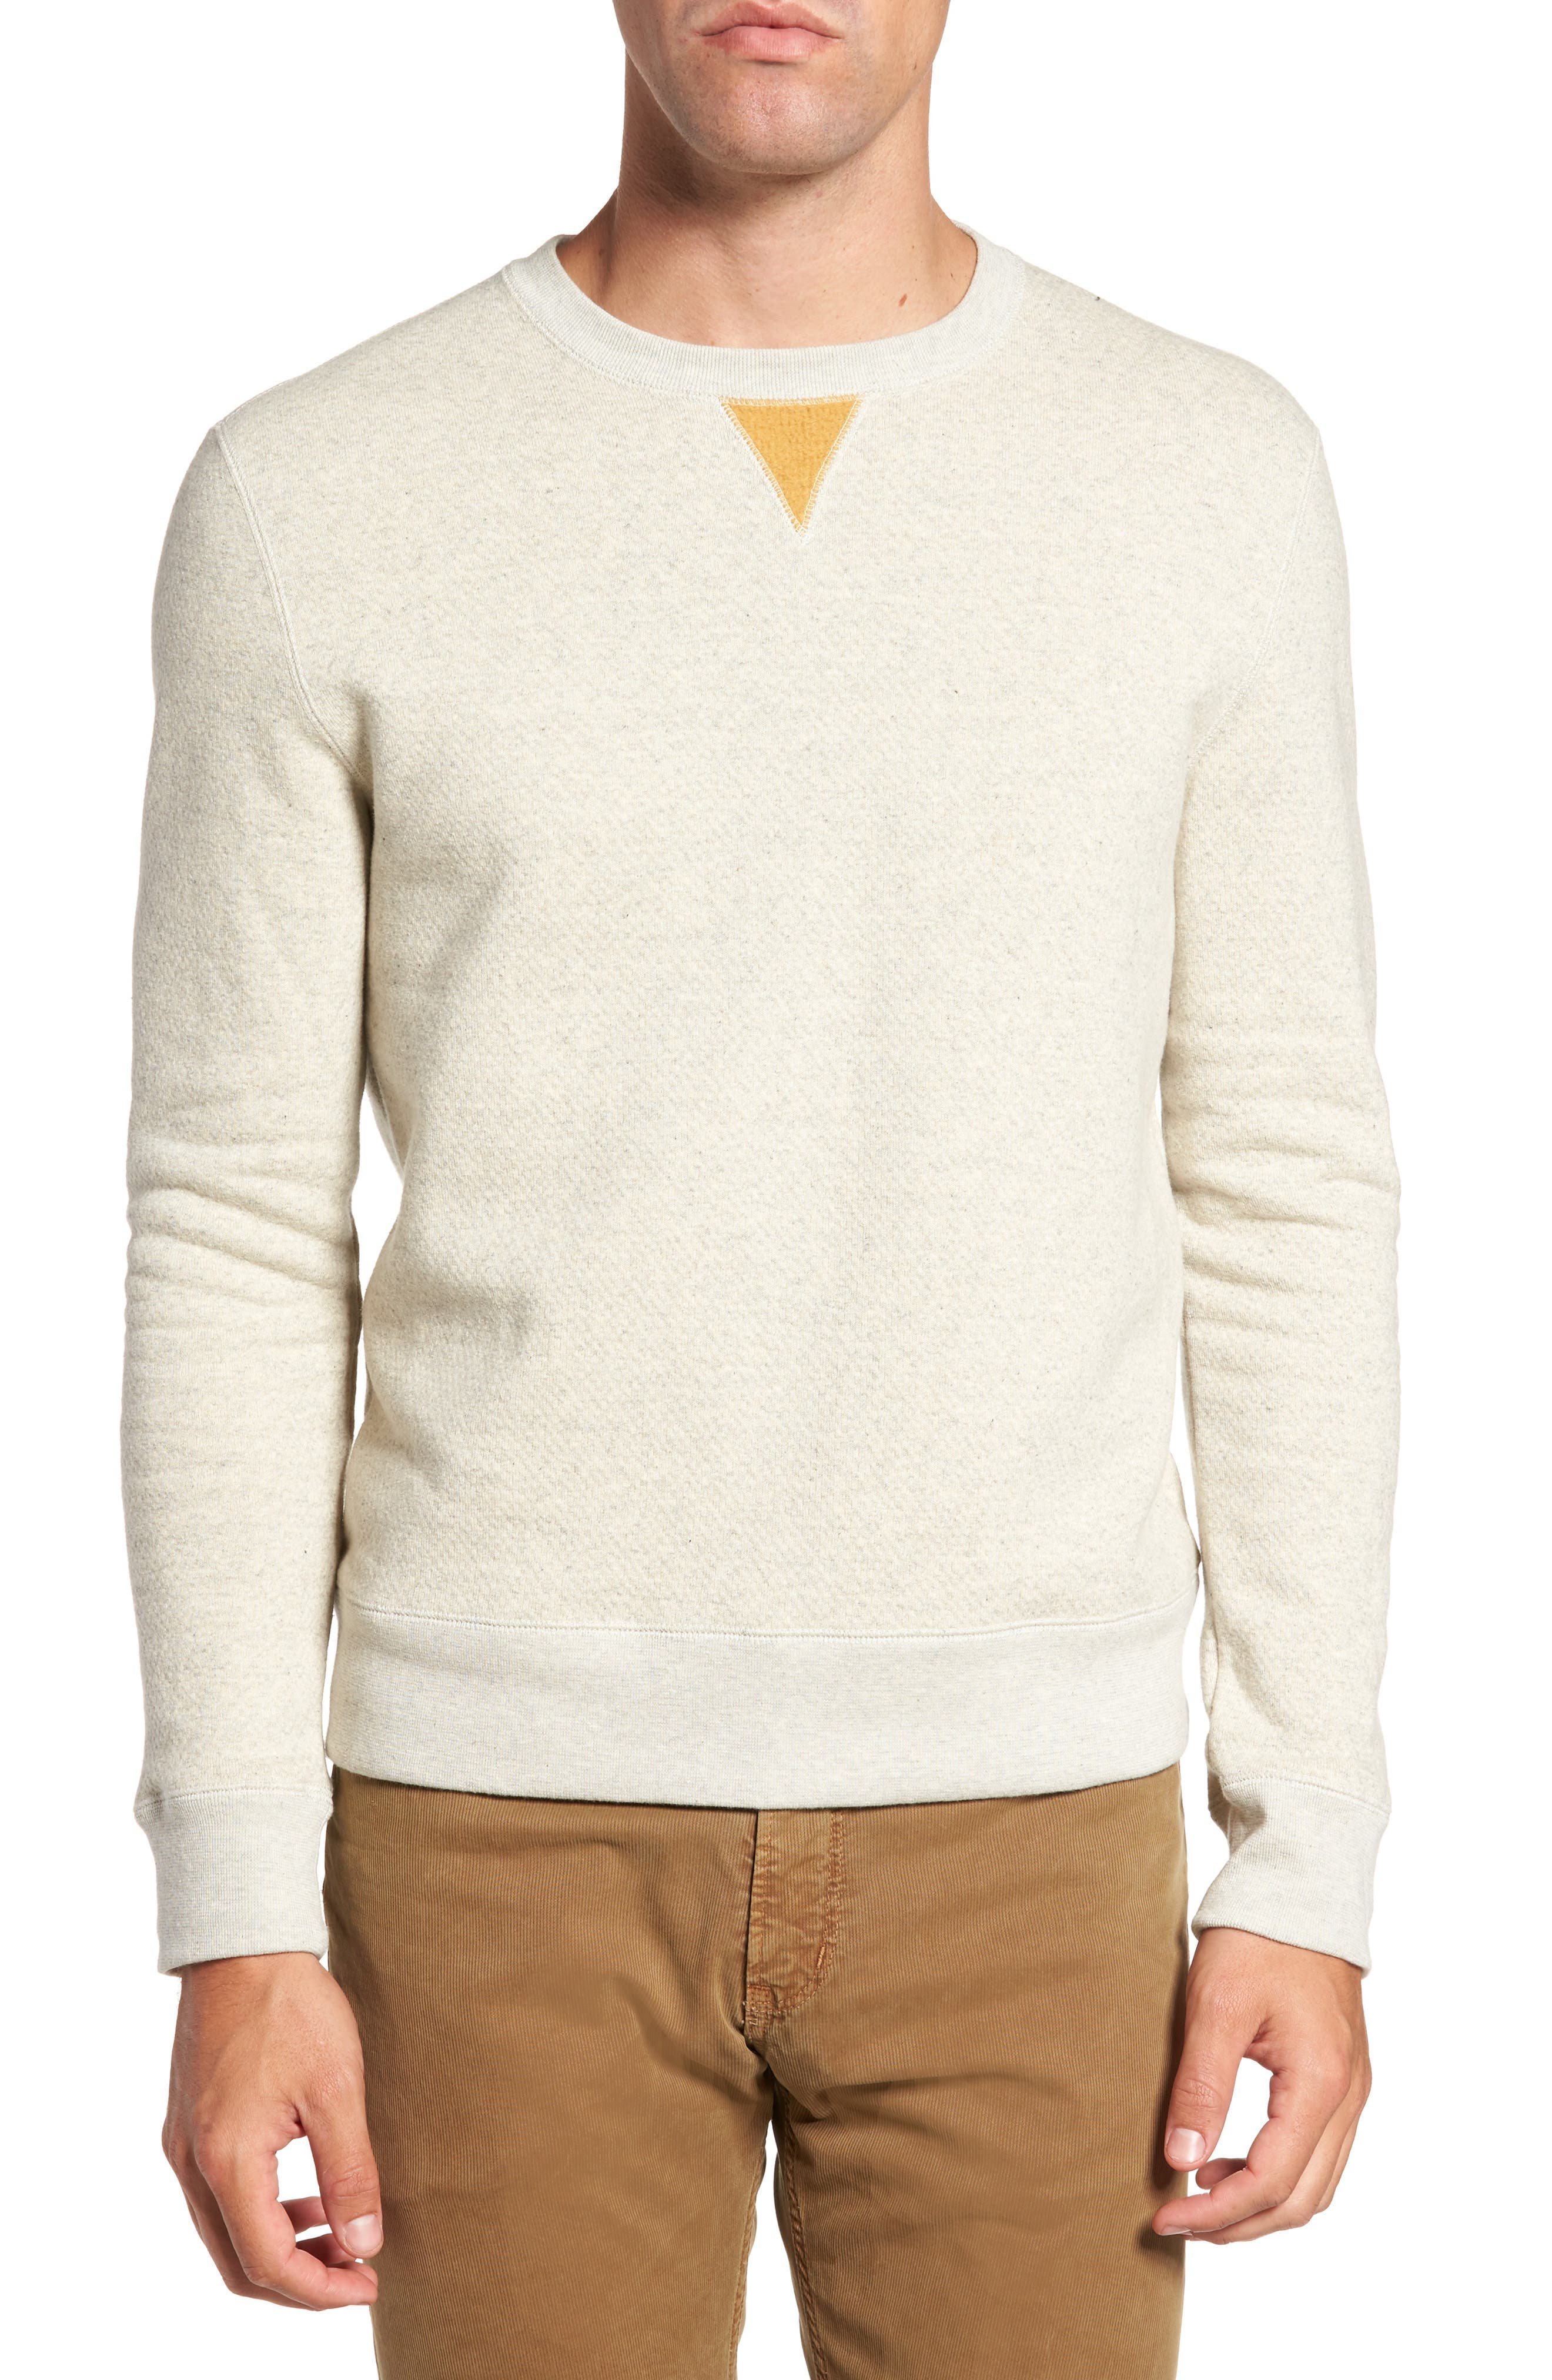 Alternate Image 1 Selected - Billy Reid Cotton Fleece Sweatshirt